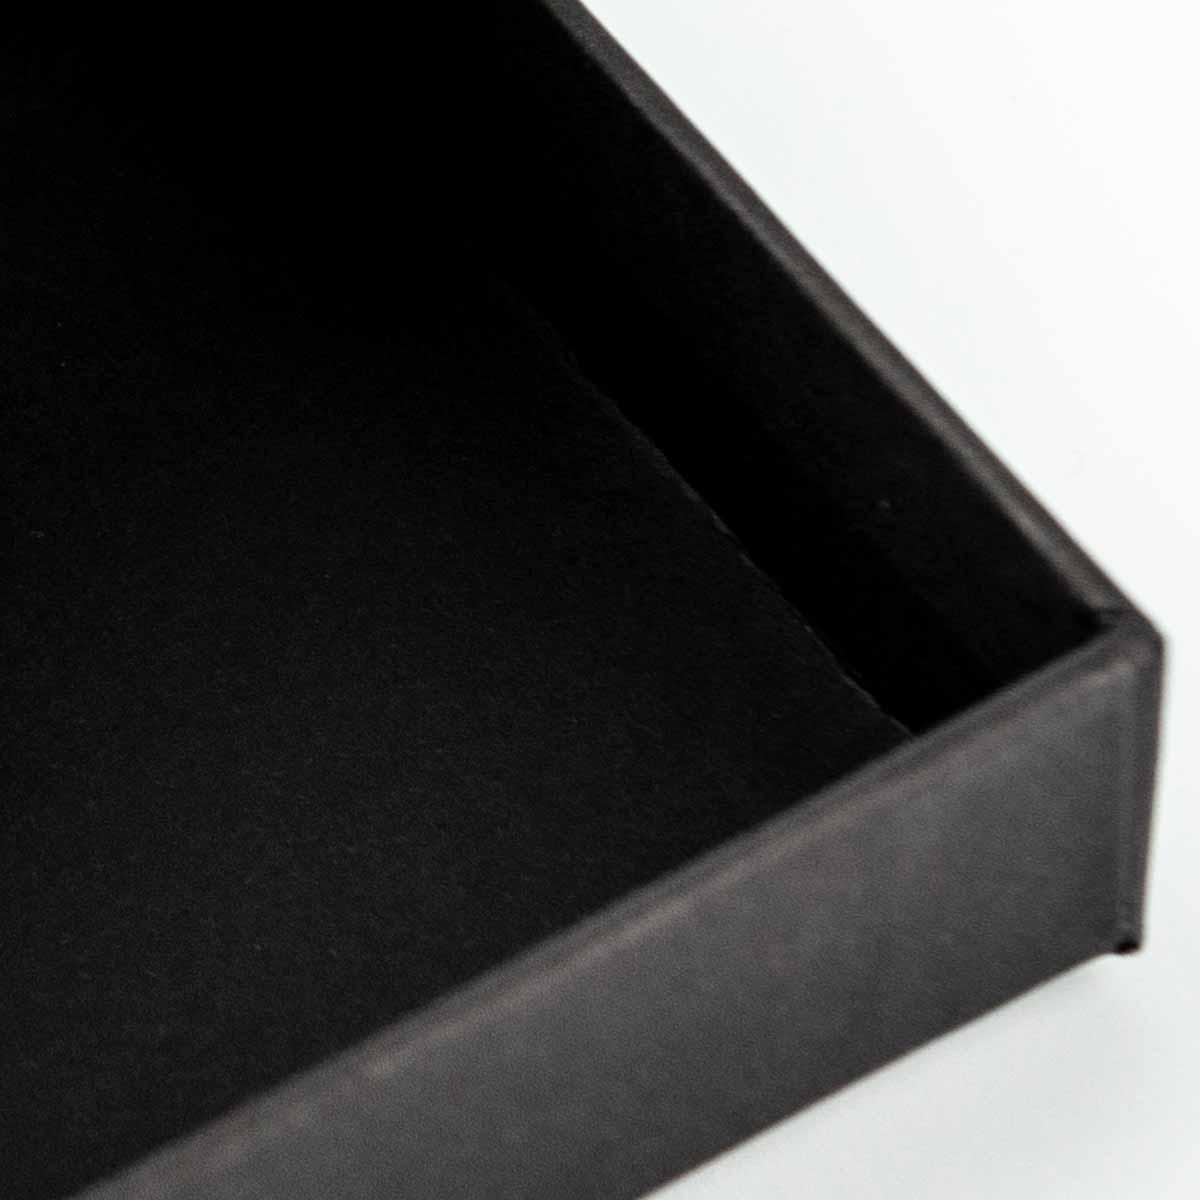 Interno packaging a scatola per calze da donna